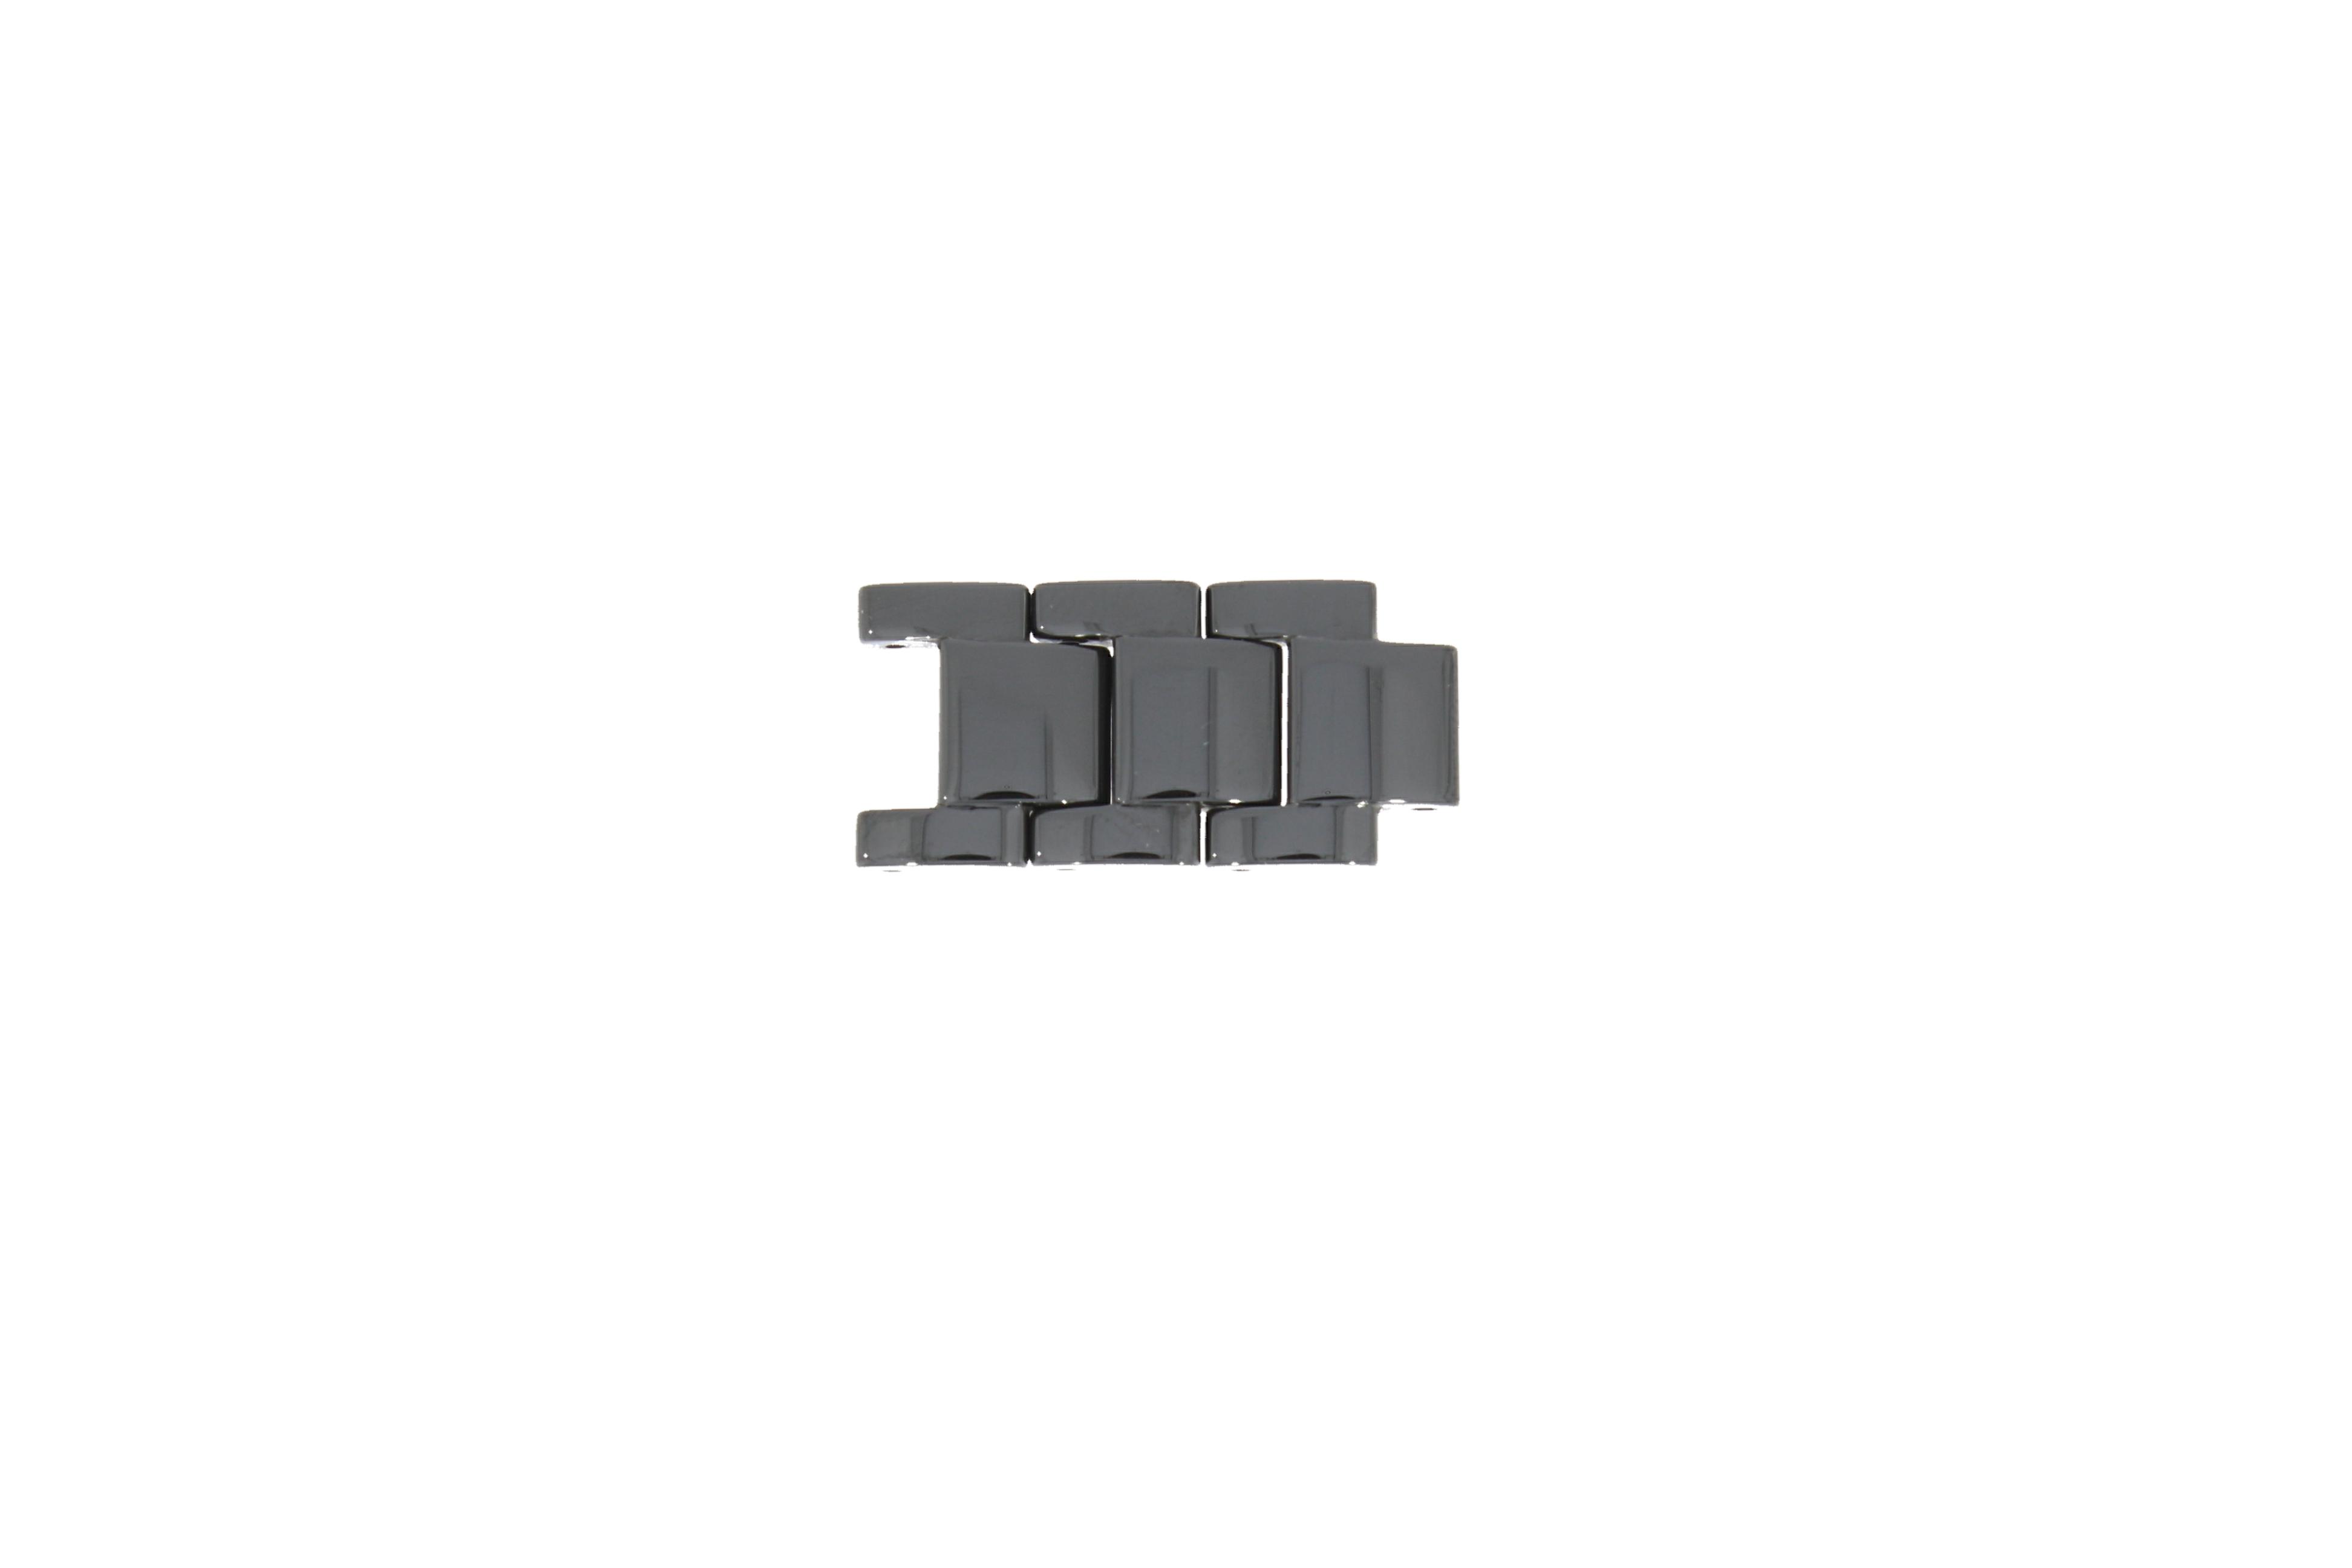 DKNY Klocklänkar NY4980 / NY4981 - 14mm - (3 stycken)